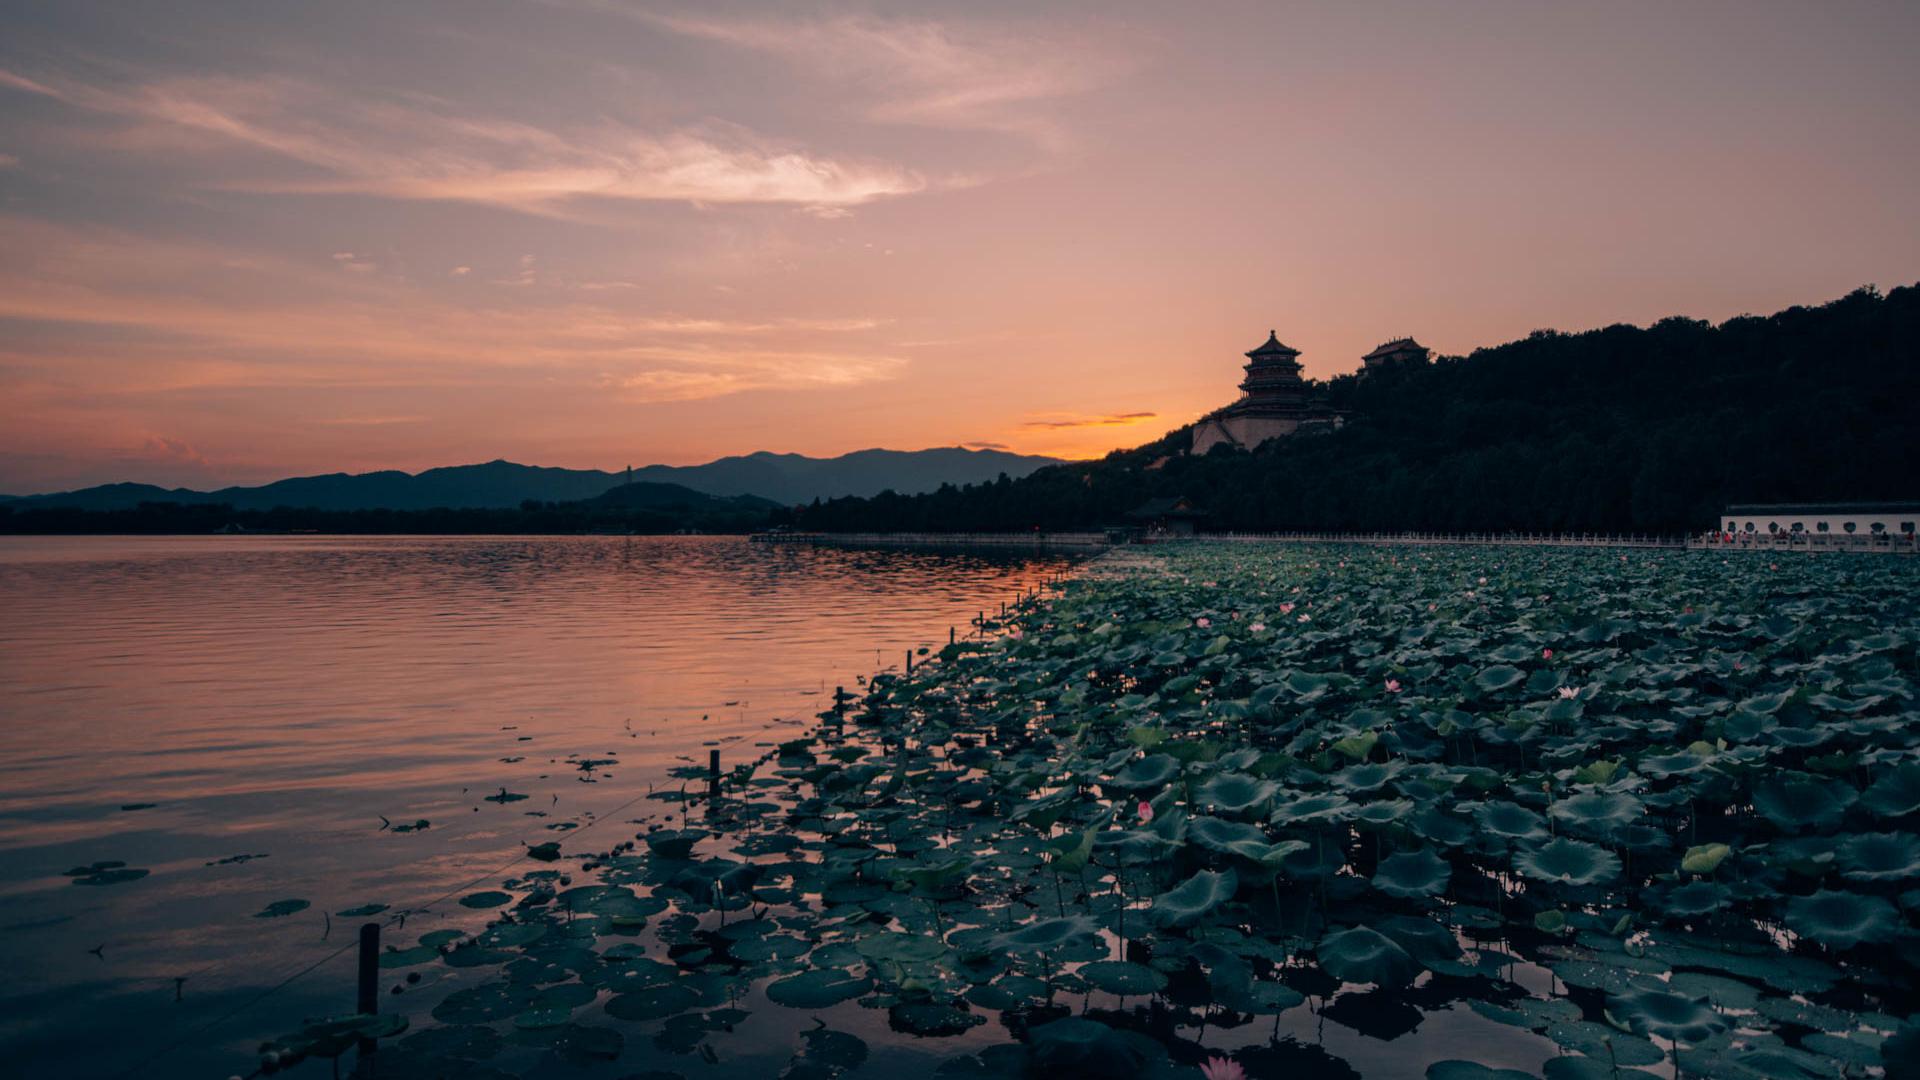 DSC_0284_pechino_summer_palace_travel_psych_chiara_cina